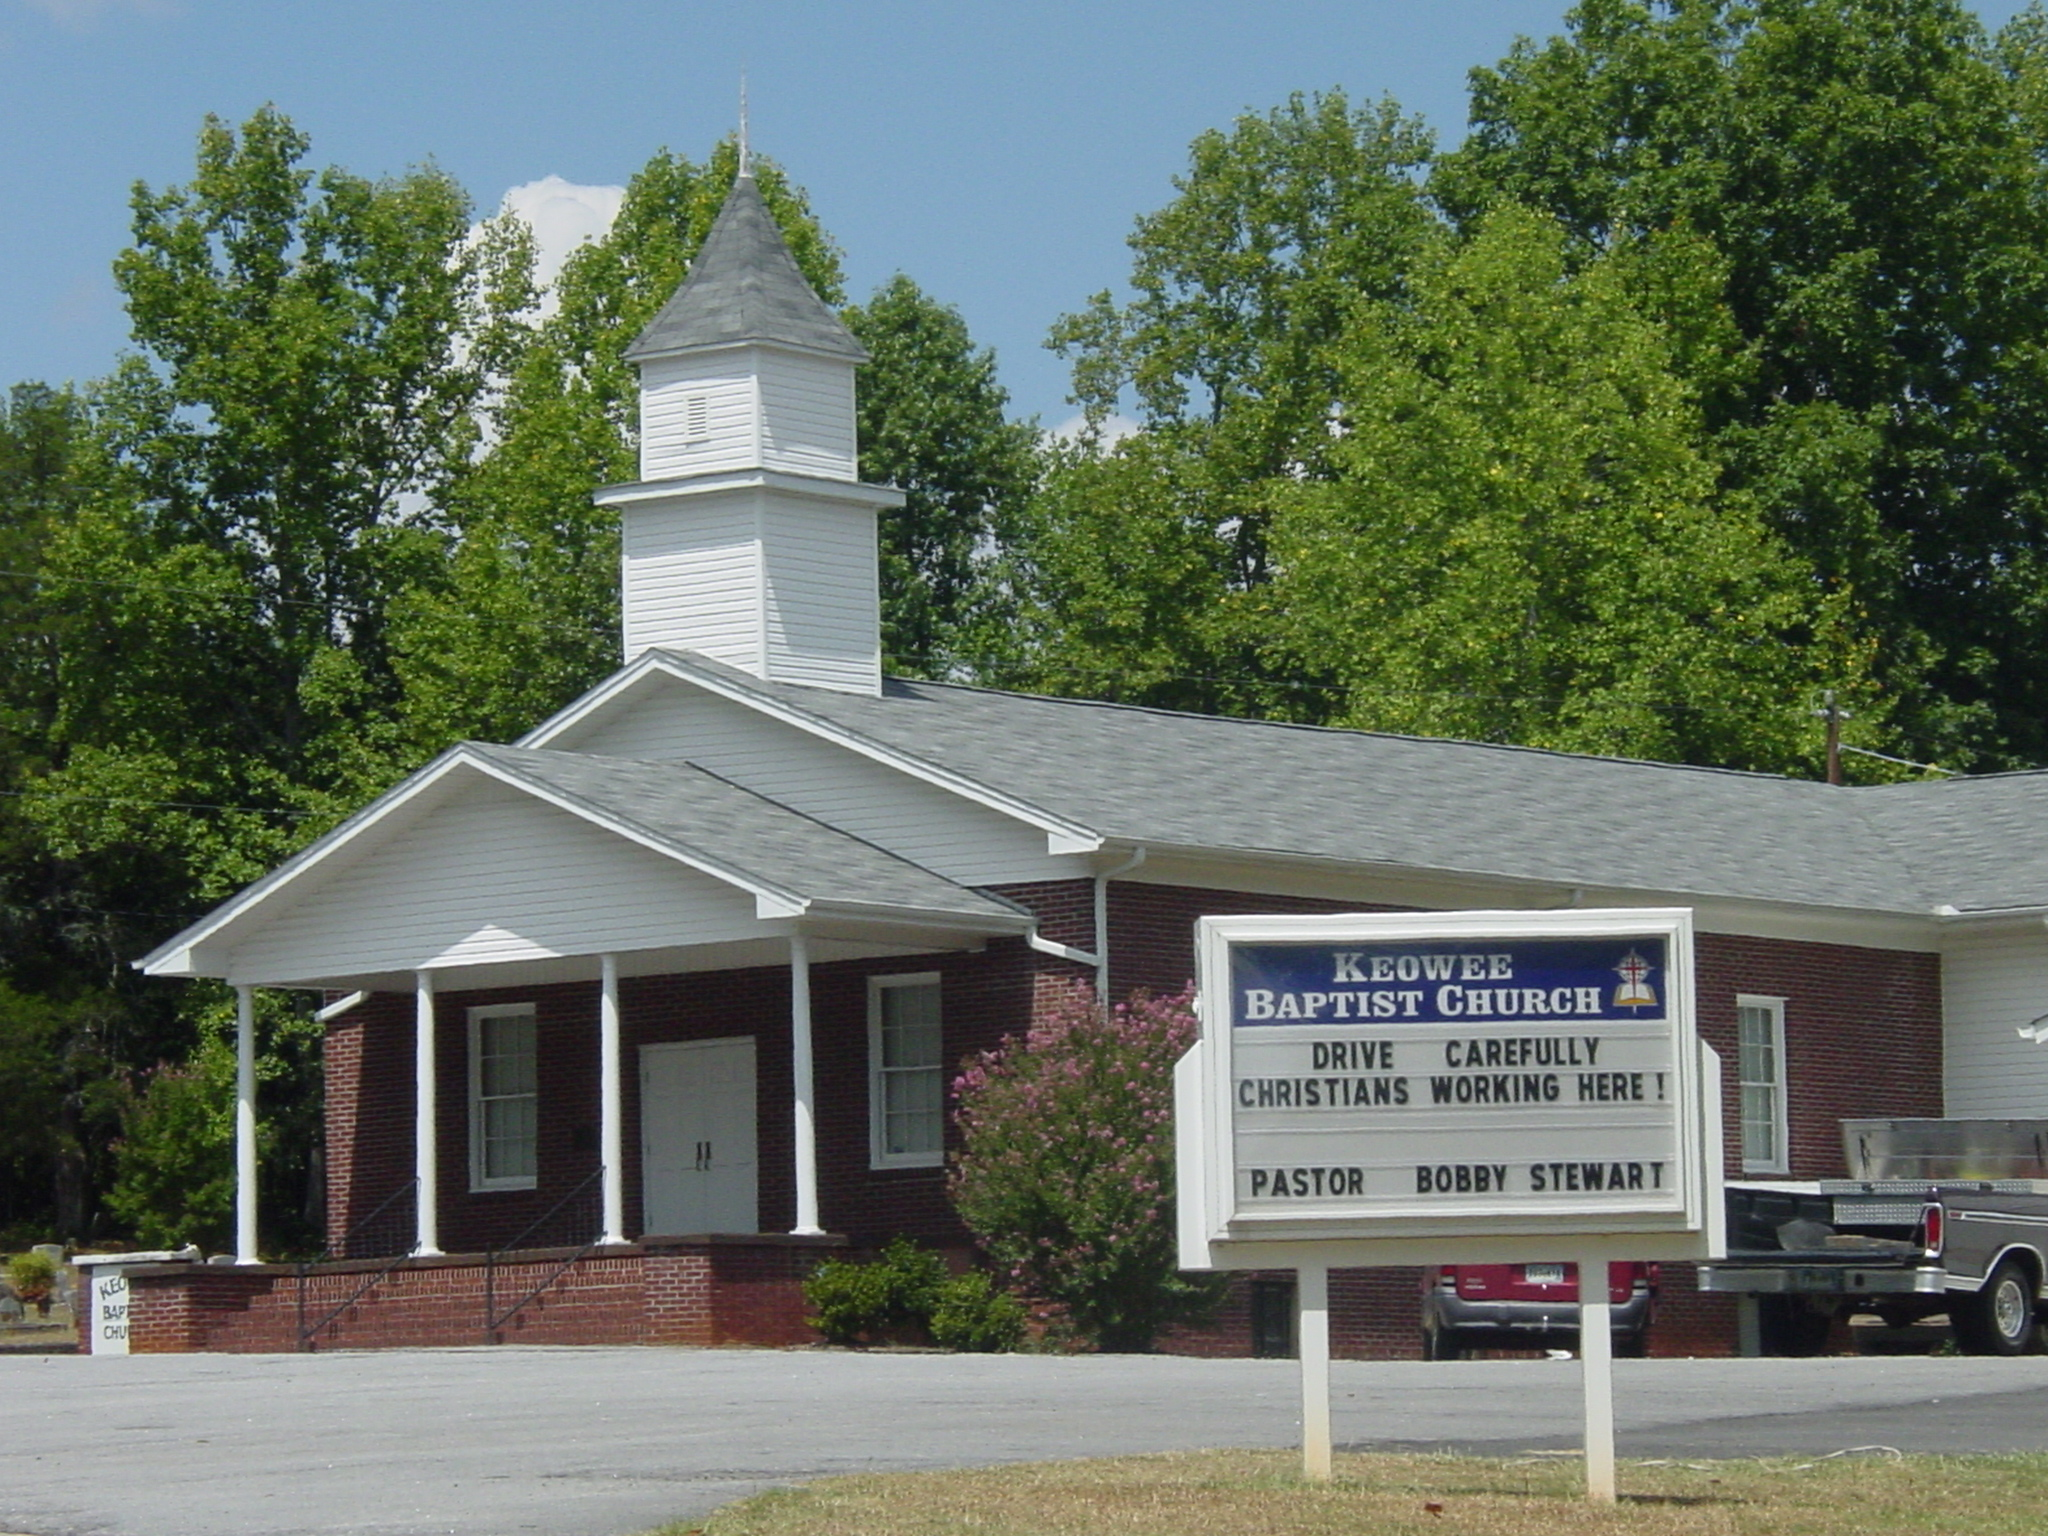 Keowee Baptist Church Cemetery in Six Mile, South Carolina